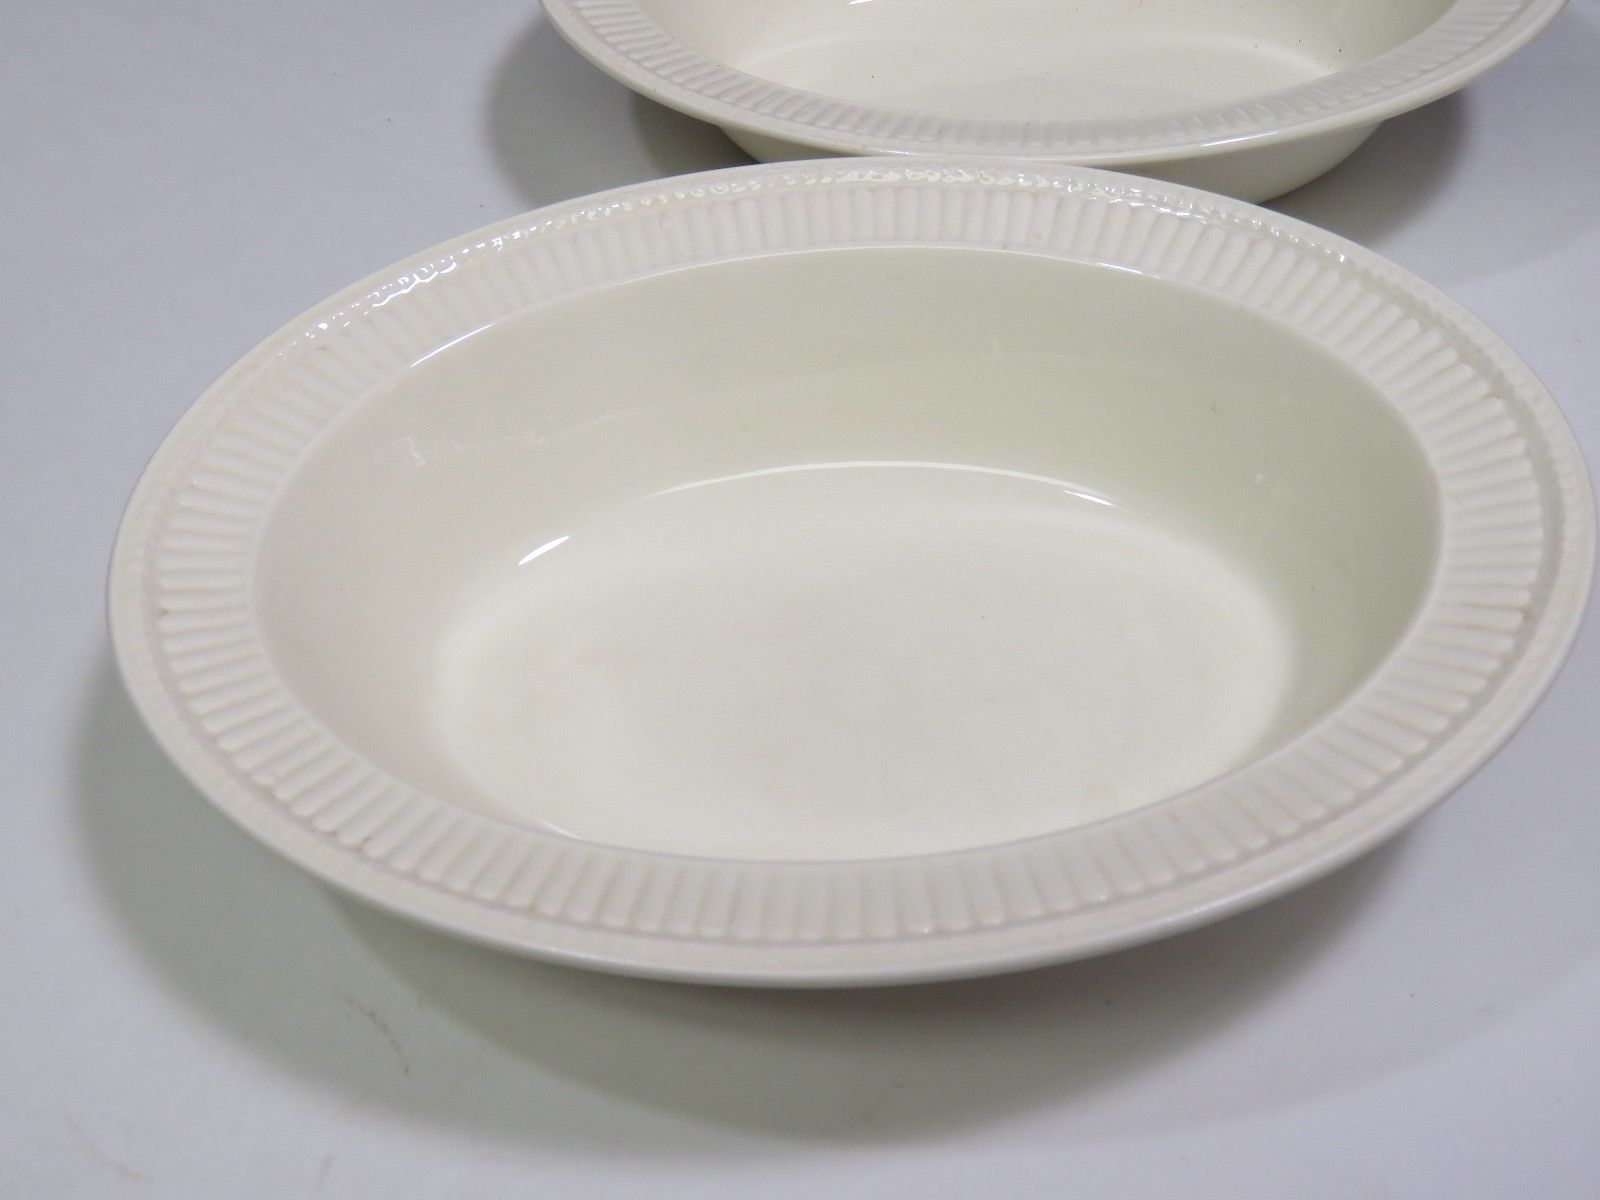 "2 Wedgwood Edme Creamware Oval Vegetable Serving Bowls 10.75"" image 7"